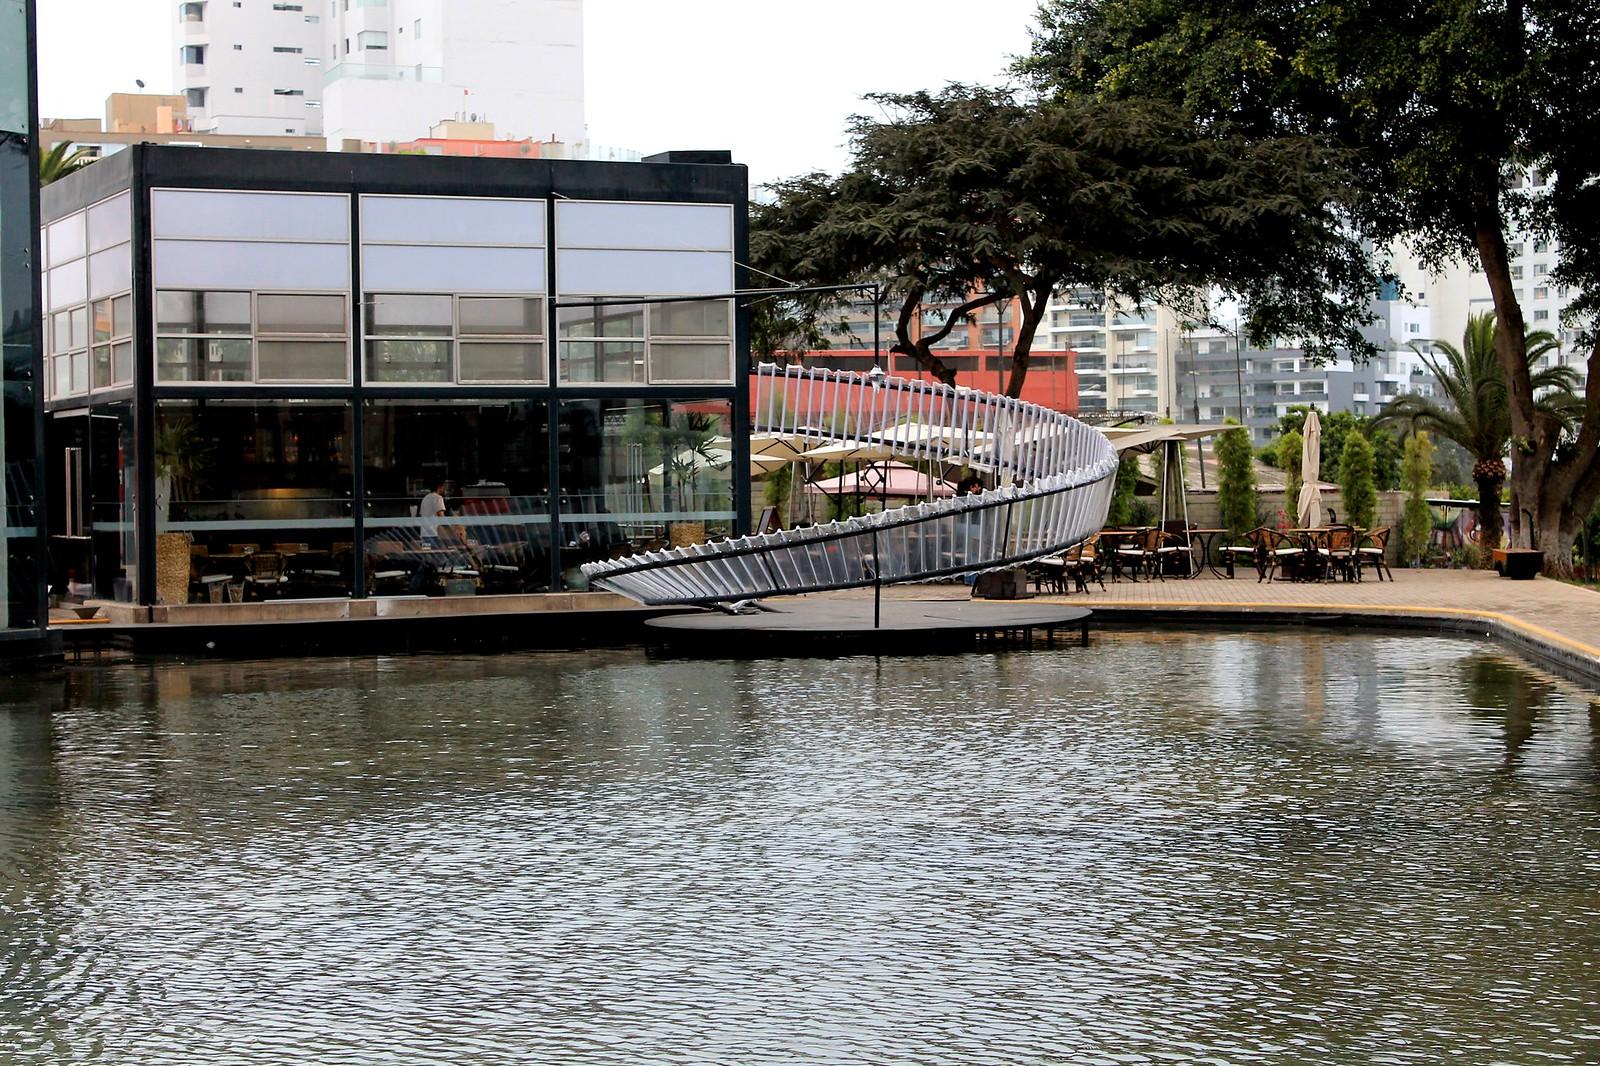 ModernMuseum